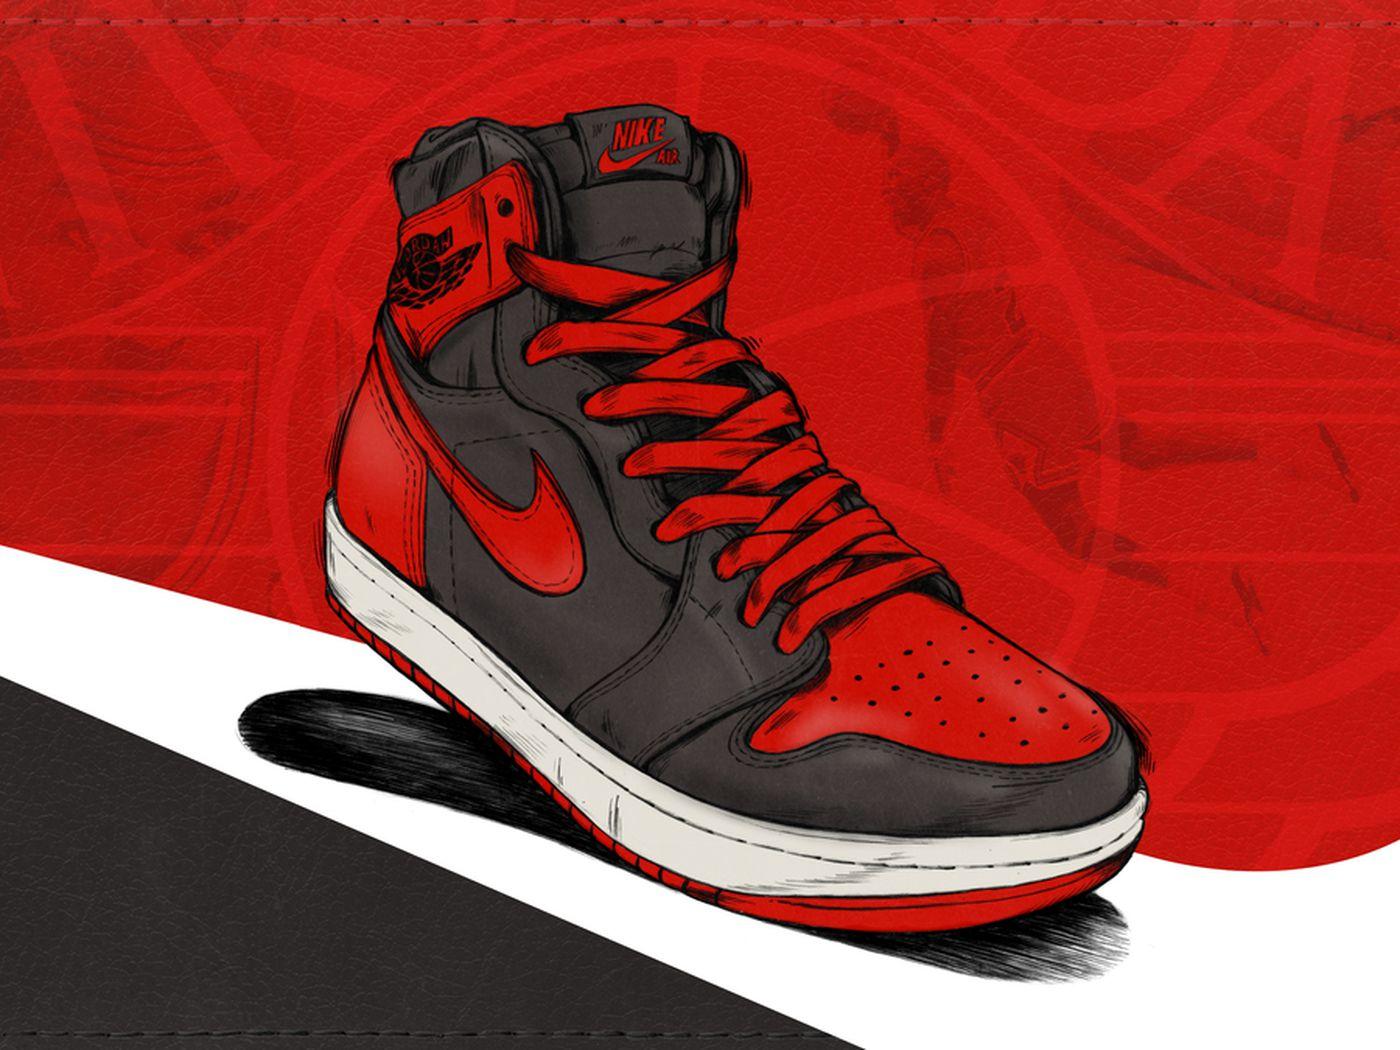 interfaz Expresamente estimular  How Nike's Air Jordan 1 Became the Sneaker King - The Ringer